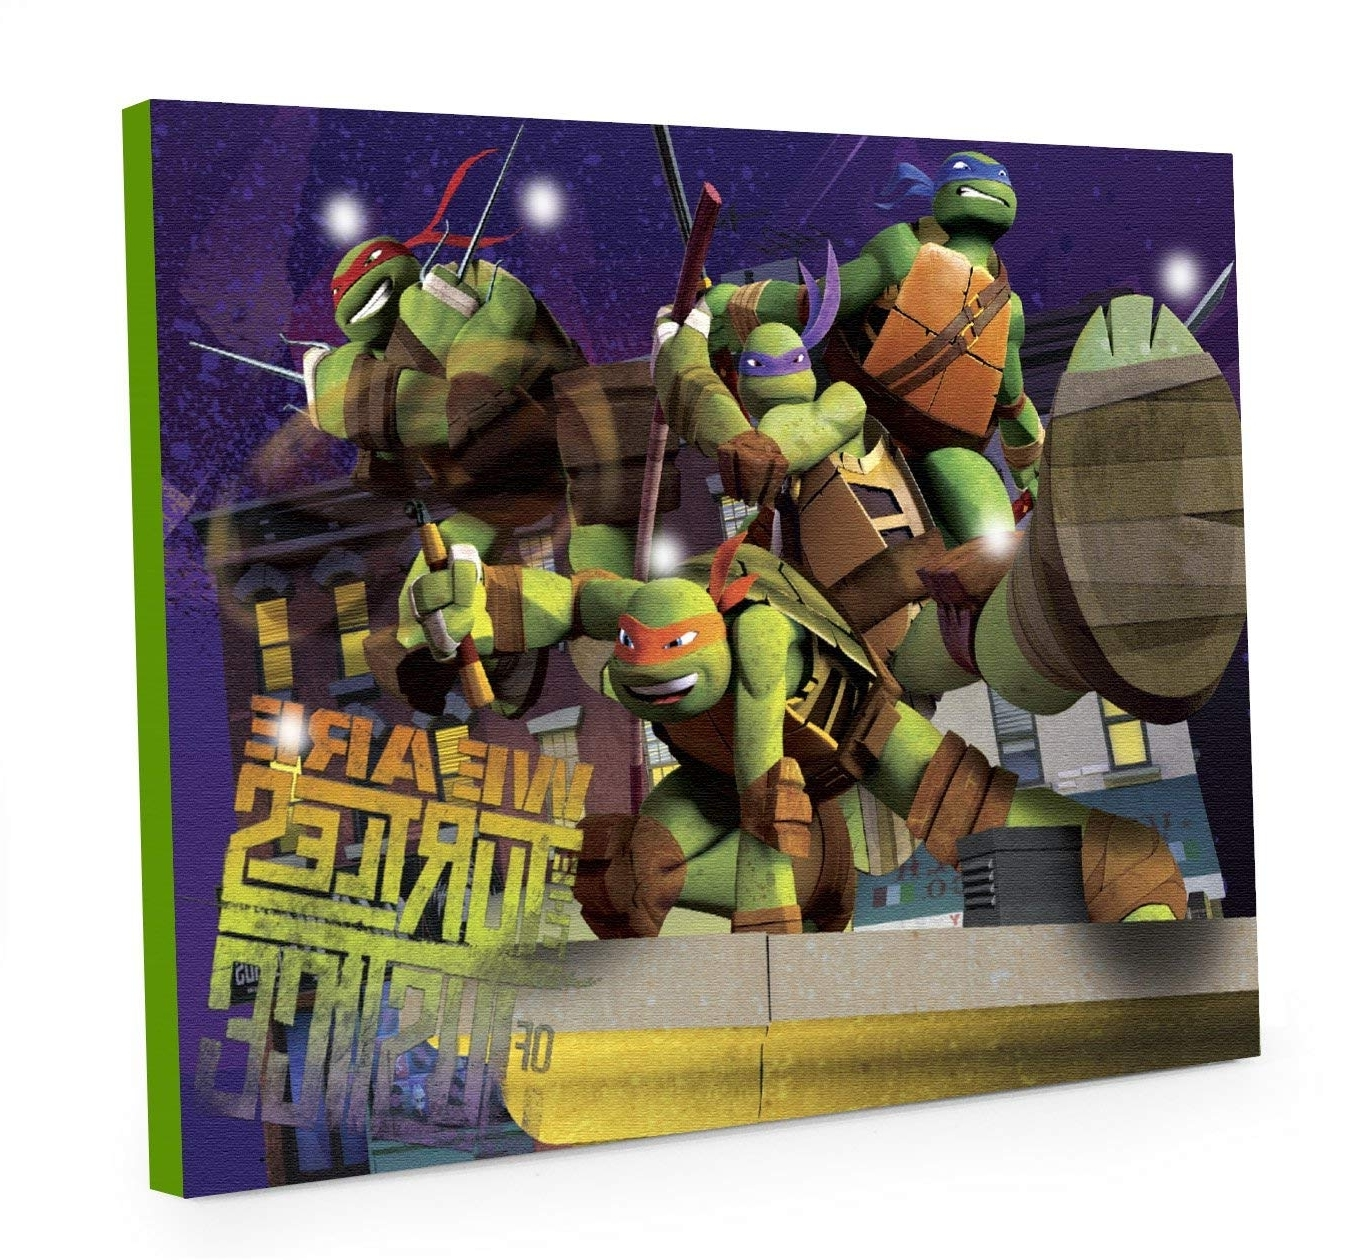 Well Liked Nickelodeon Teenage Mutant Ninja Turtles – Decor Intended For Ninja Turtle Wall Art (View 15 of 15)